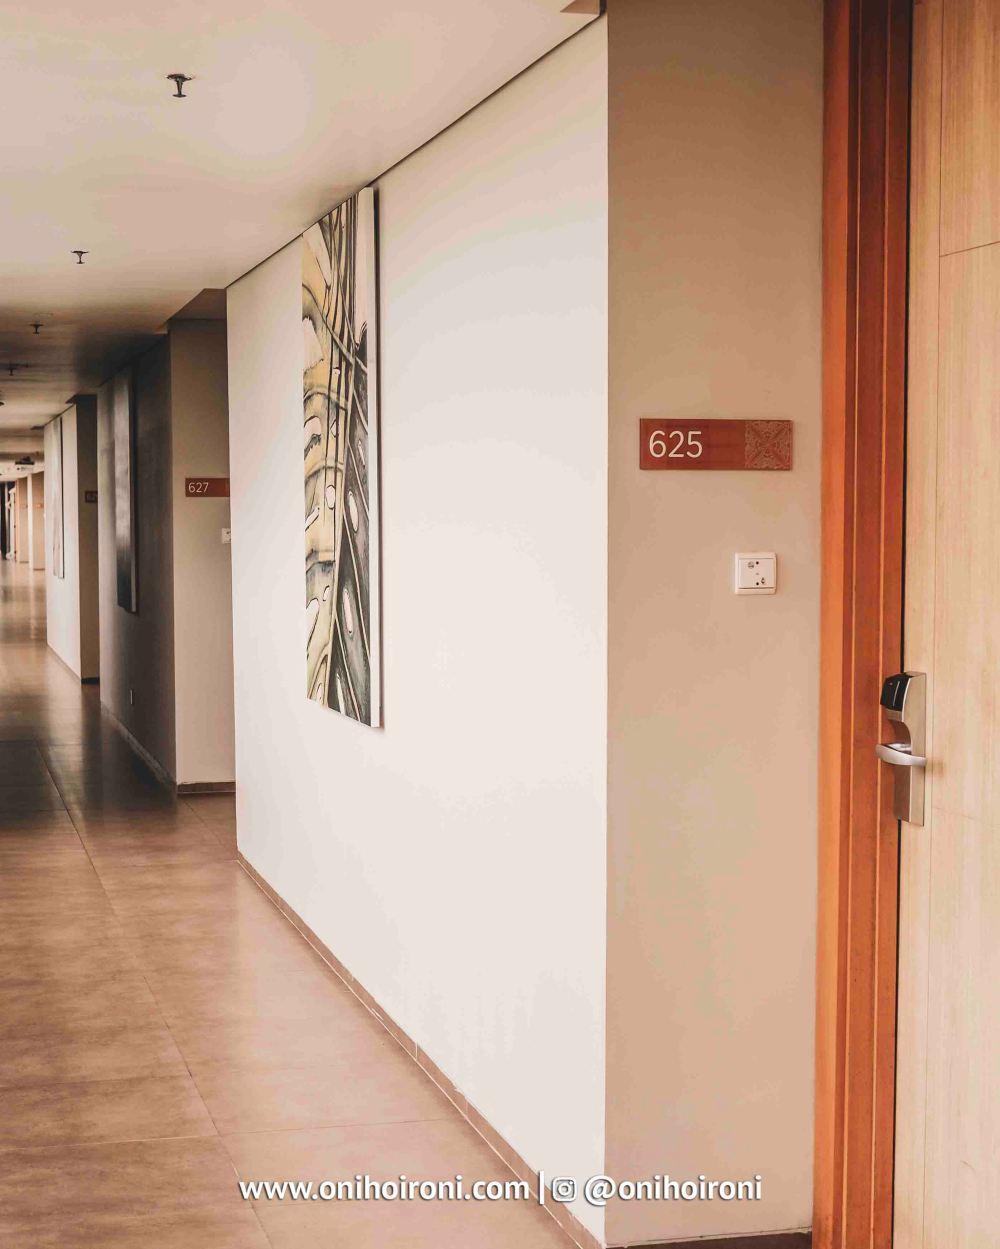 Koridor Room Courtyard Seminyak Bali .jpg